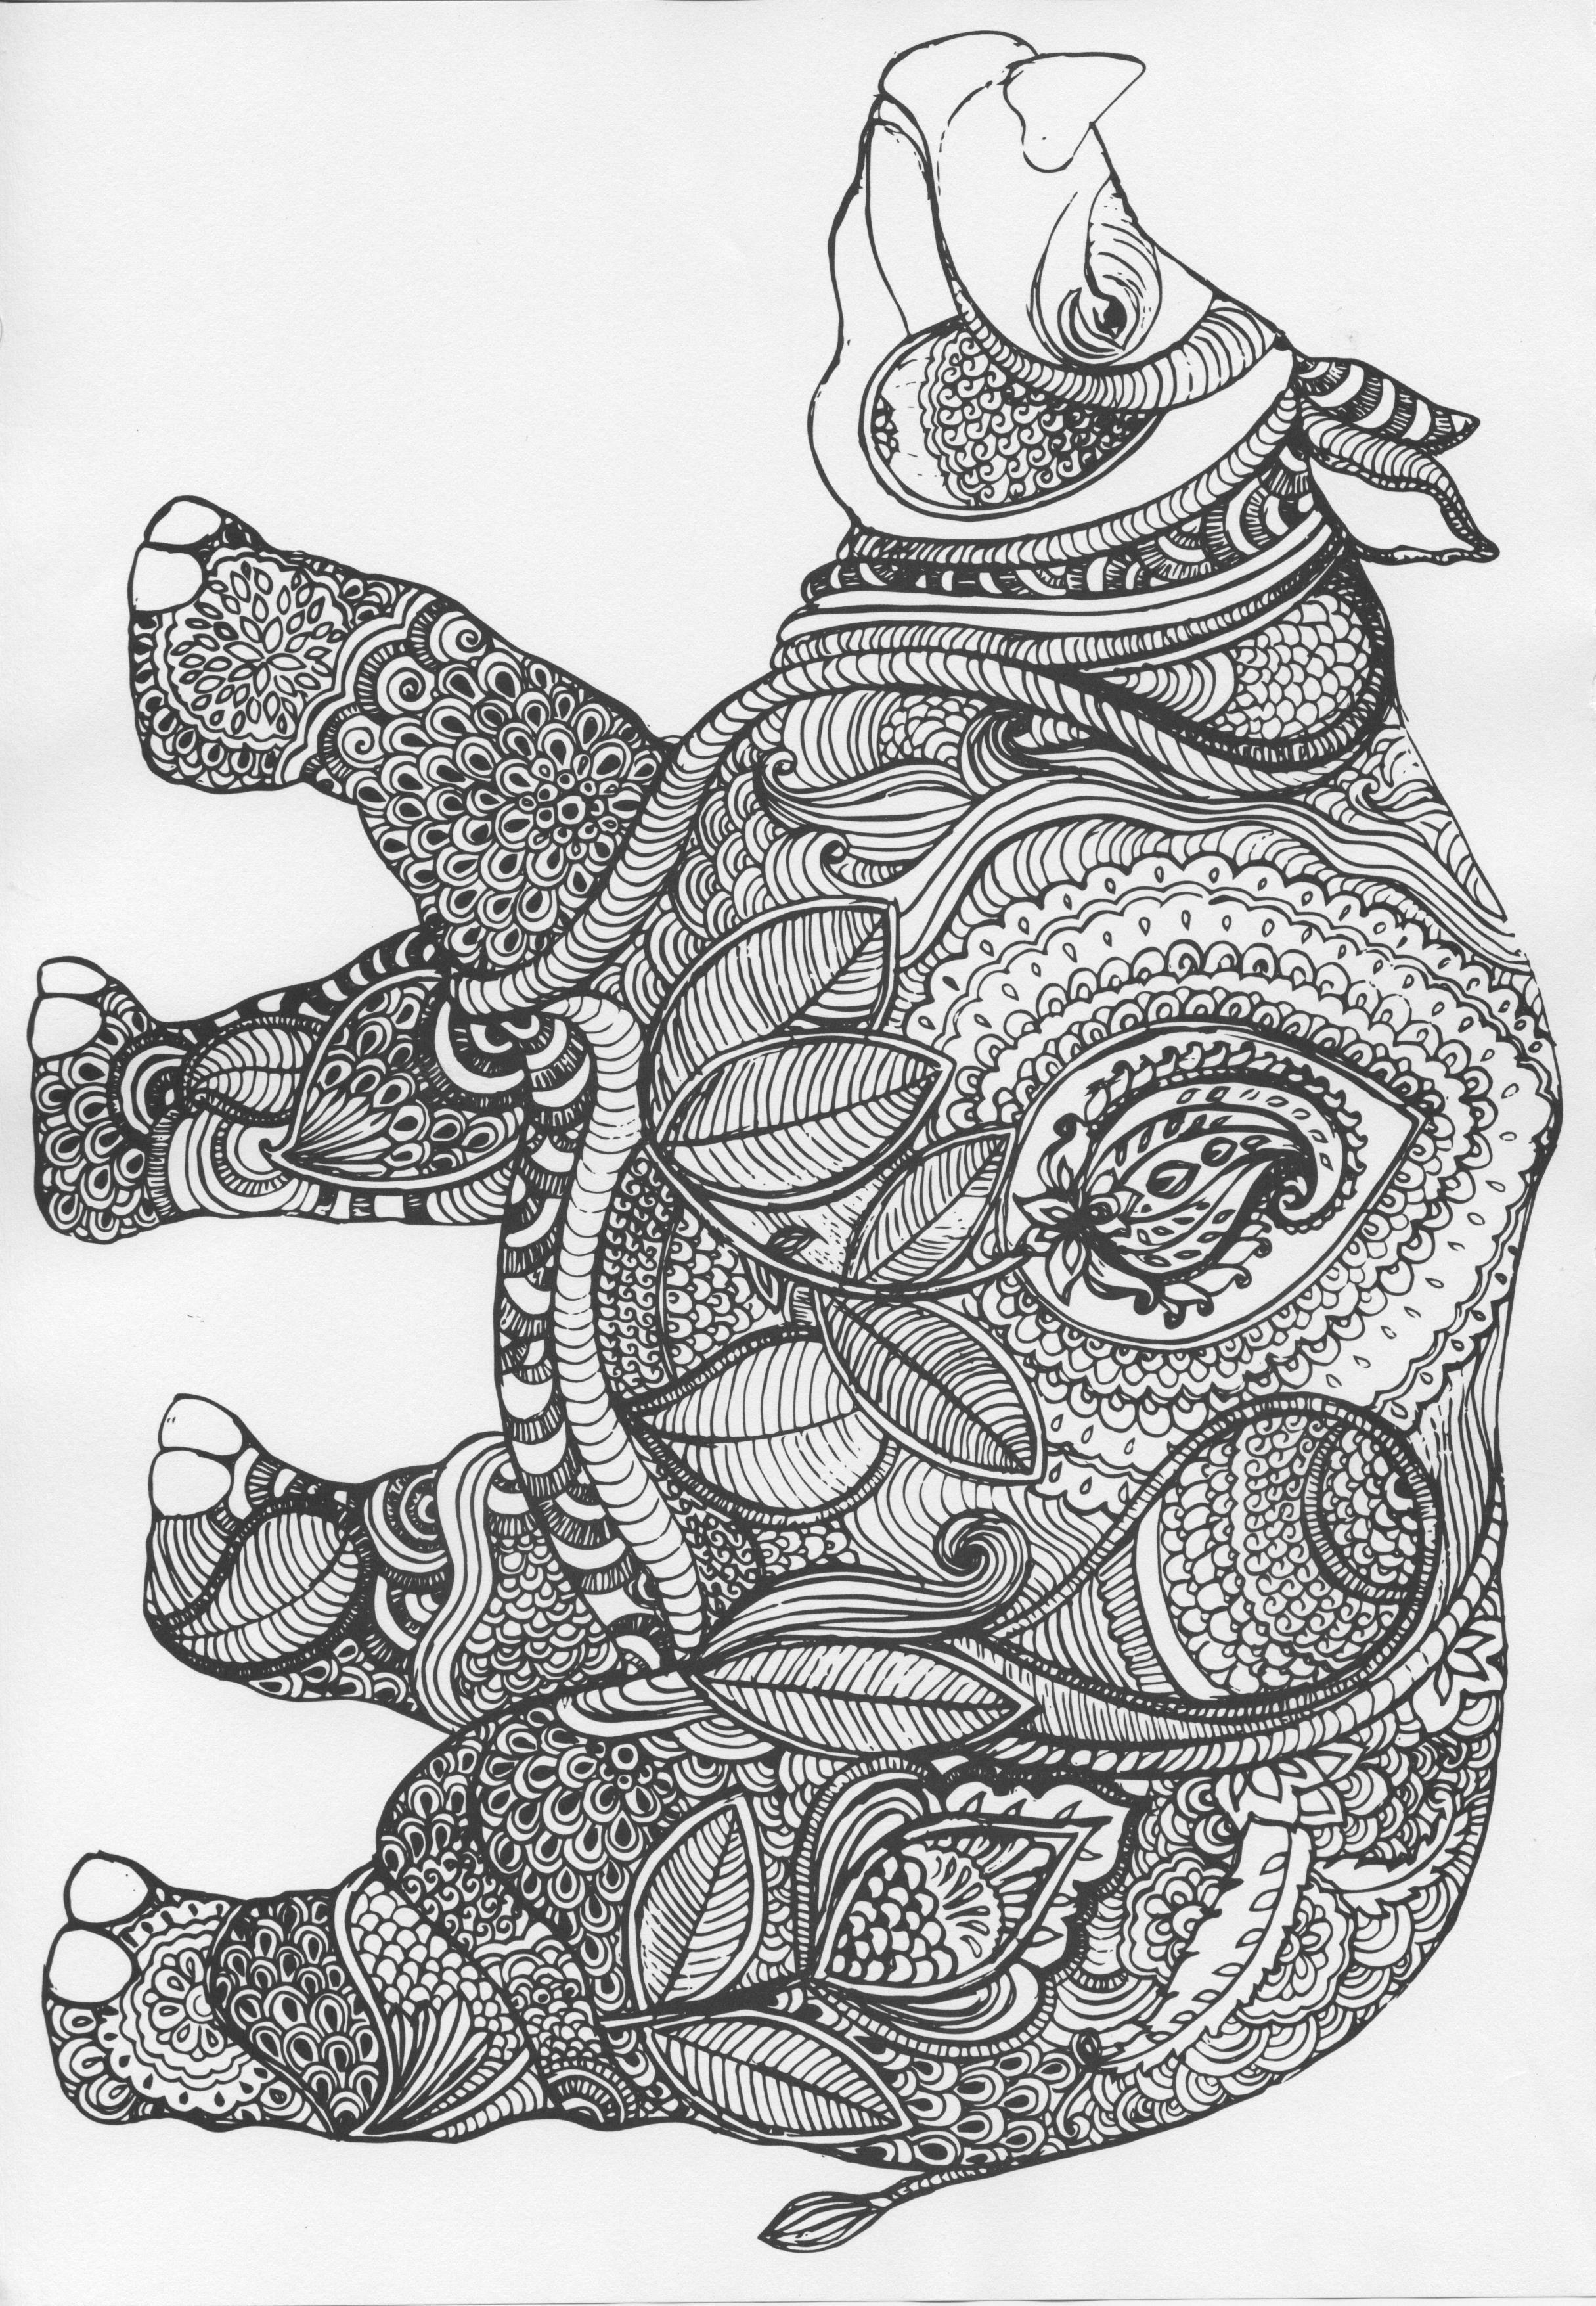 Pin de Shirley White Blazek en Designs-Coloring-Animals | Pinterest ...